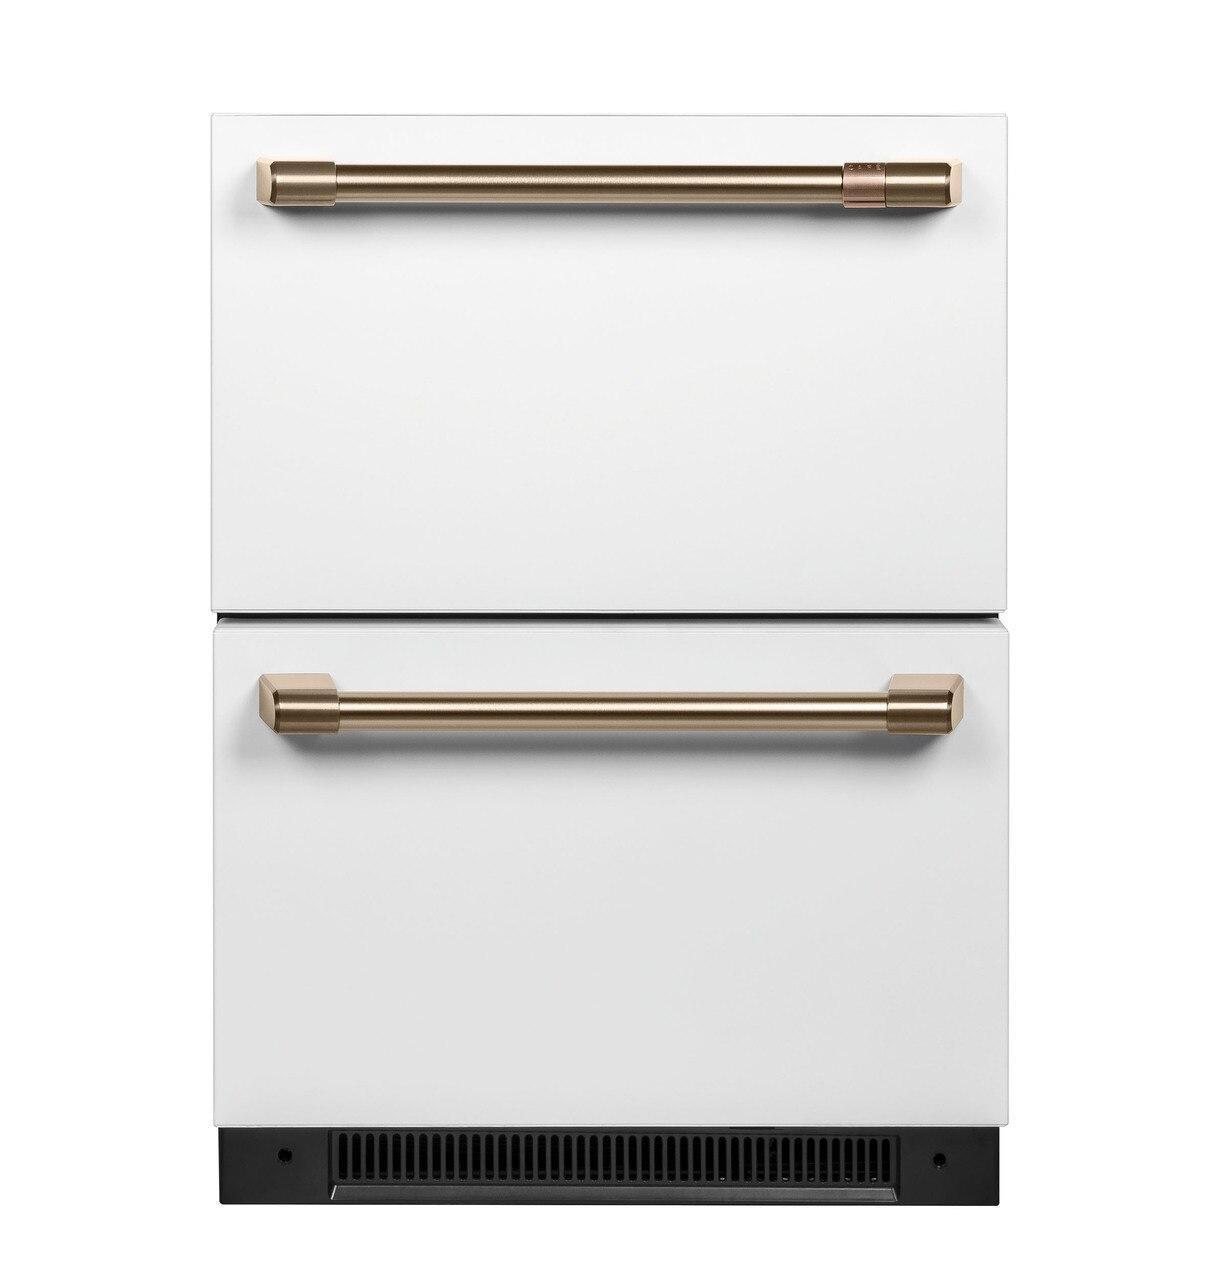 Cafe AppliancesCaf(eback)™ 5.7 Cu. Ft. Built-In Dual-Drawer Refrigerator